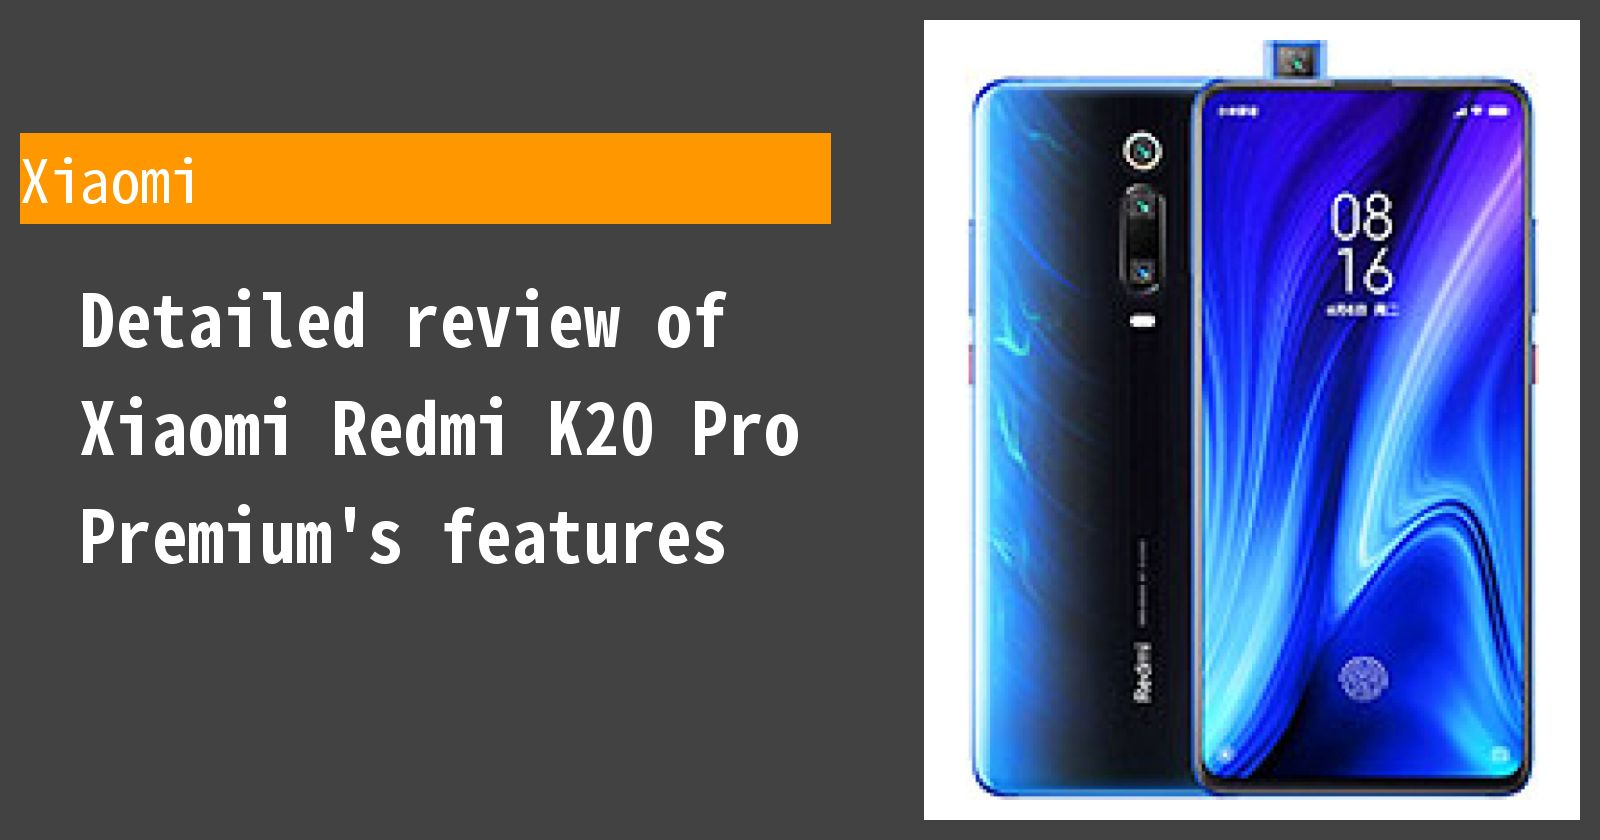 Detailed review of Xiaomi Redmi K20 Pro Premium's features